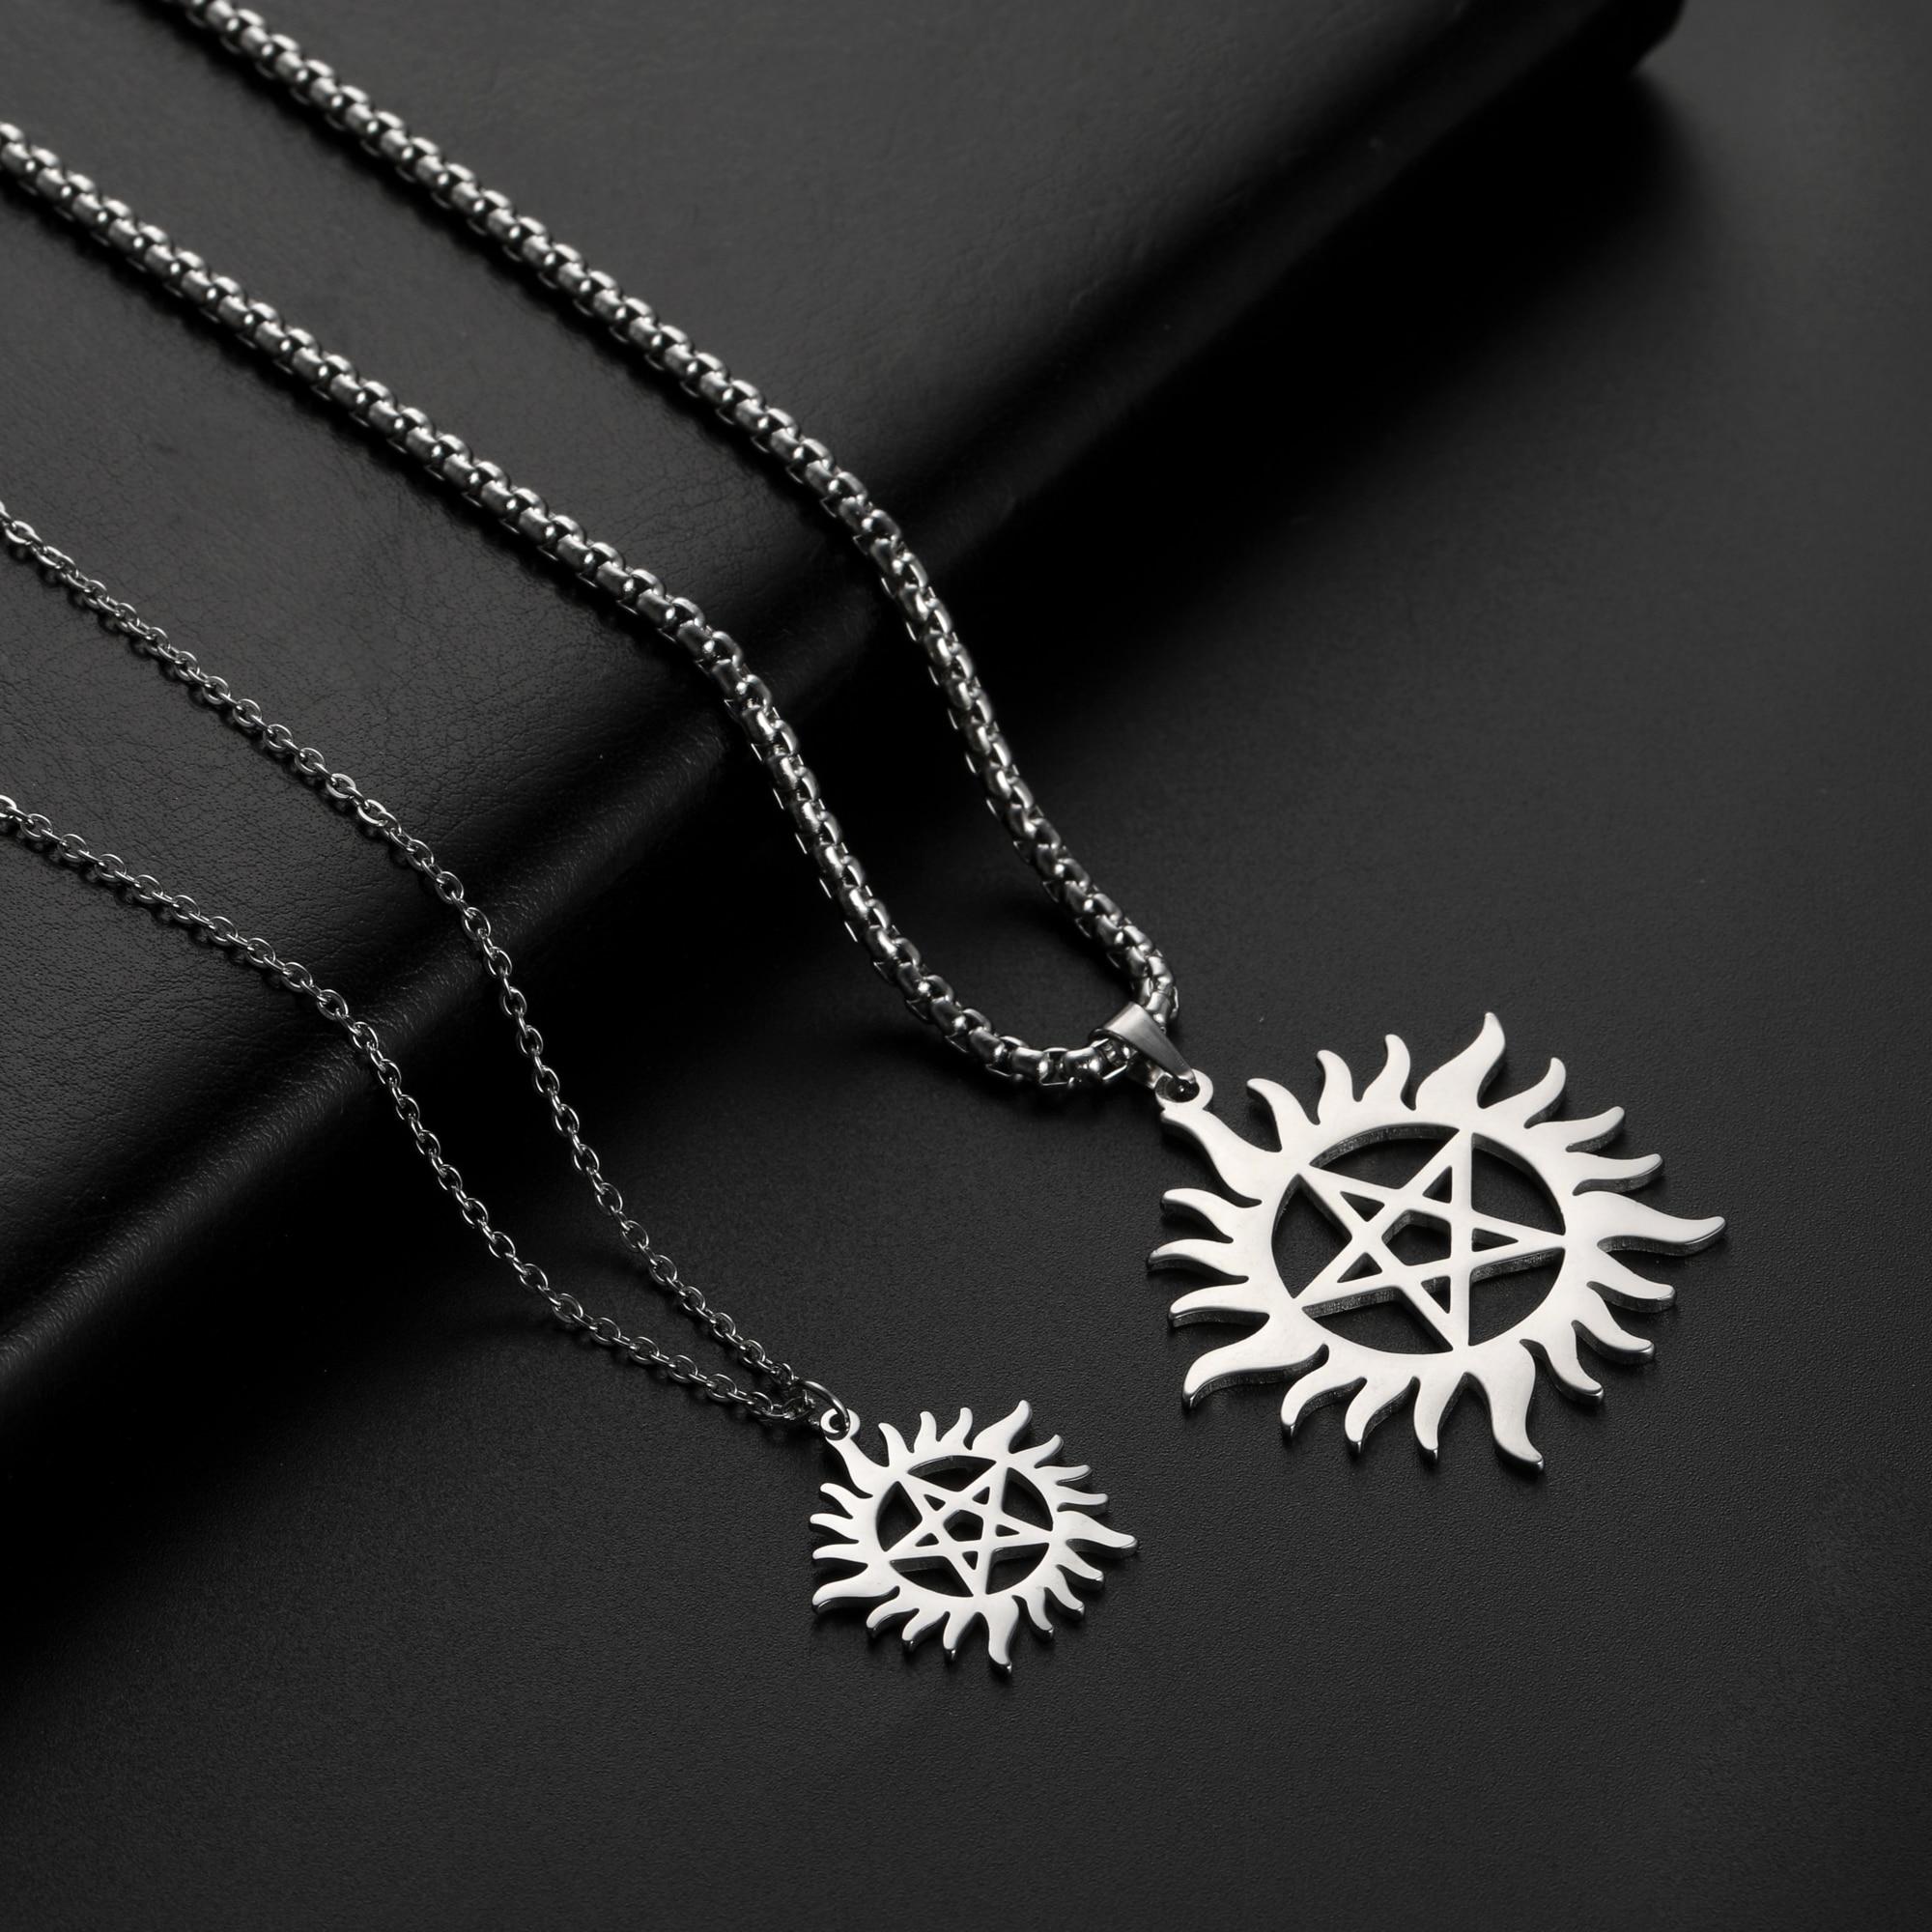 Skyrim Stainless Steel Shining Sun Pentagram Pendant Necklace Supernatural Dean Statement Box Chain Necklaces Jewelry Women Men